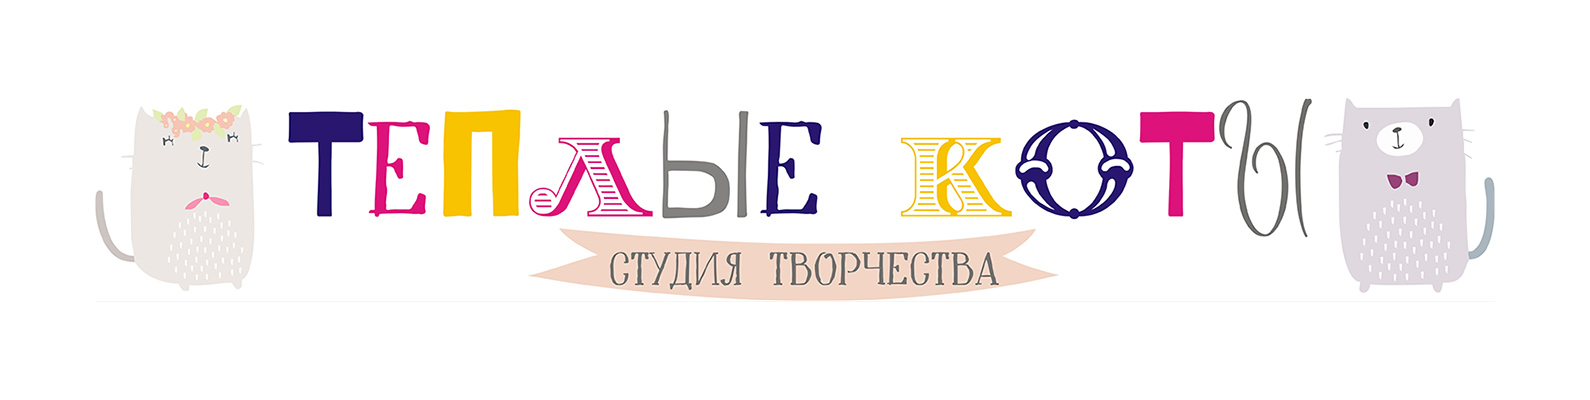 Студия творчества ТЕПЛЫЕ КОТЫ.